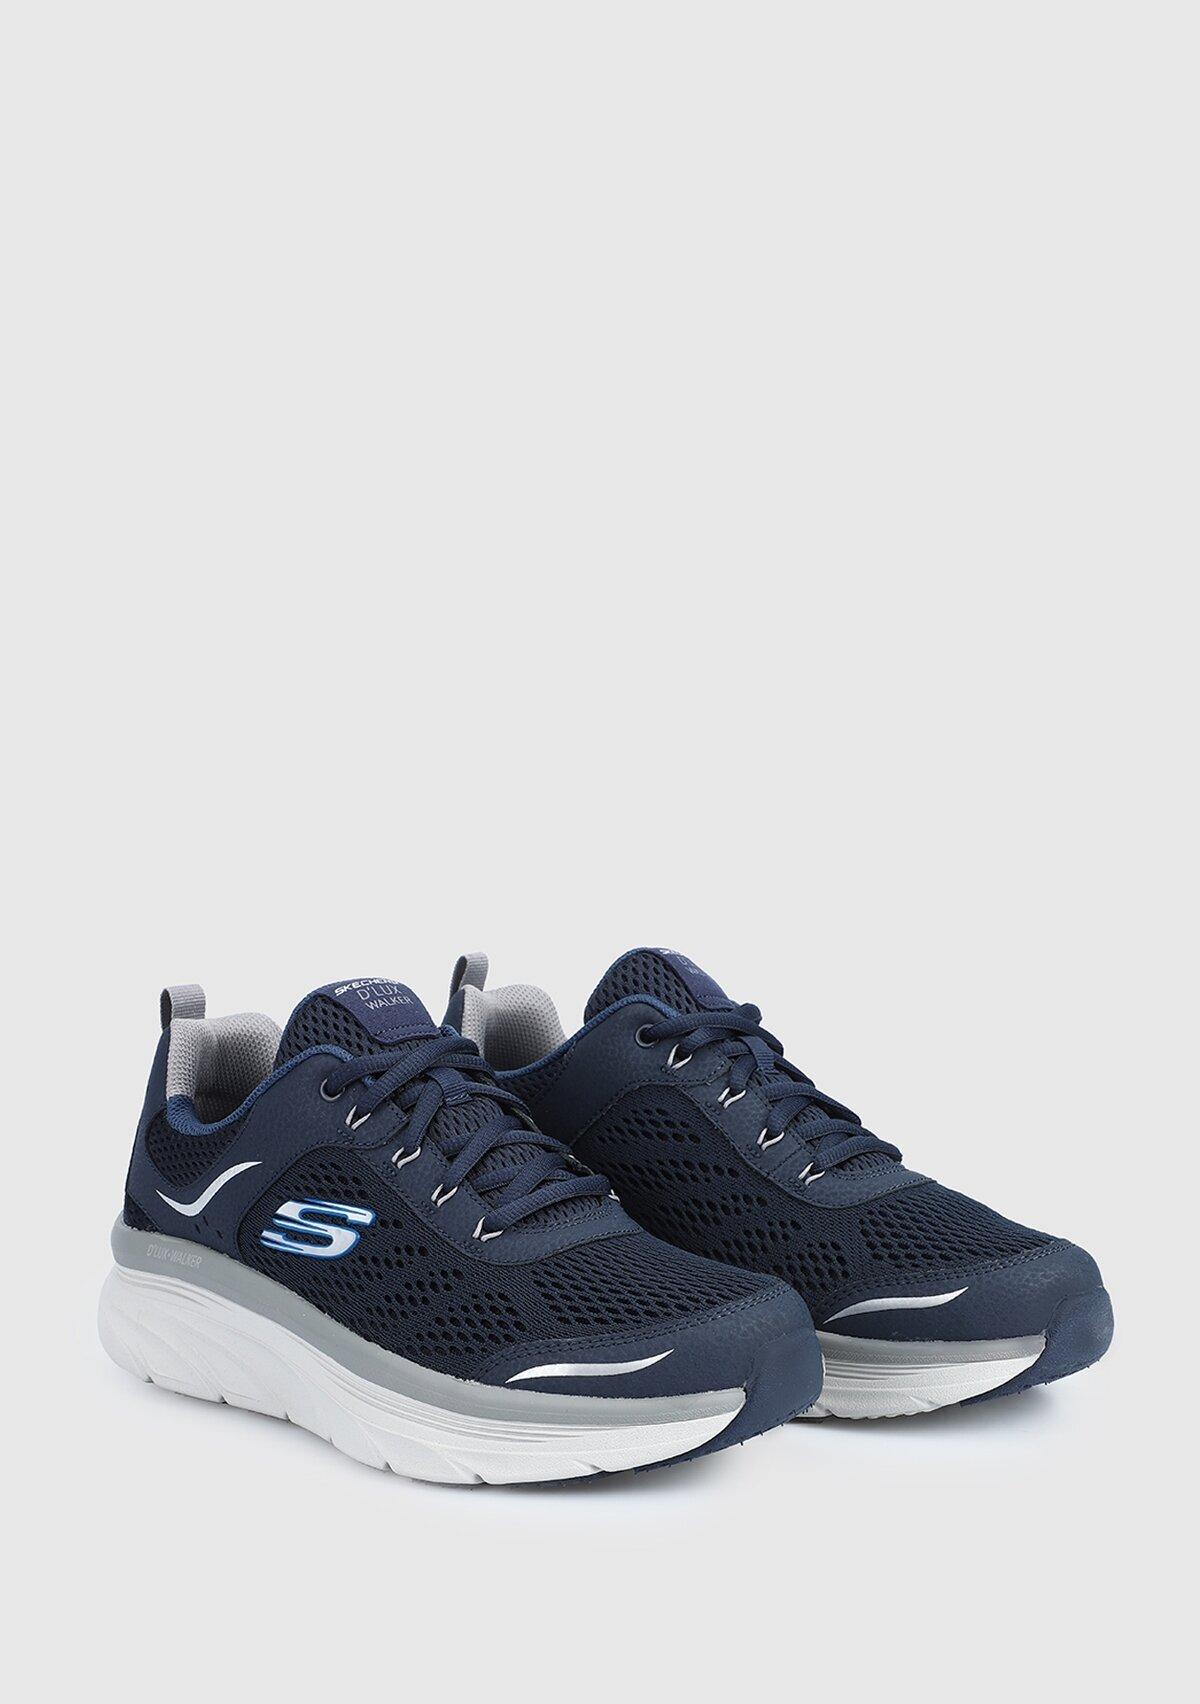 resm D'Lux Walker Lacivert Erkek Sneaker 232044Nvgy